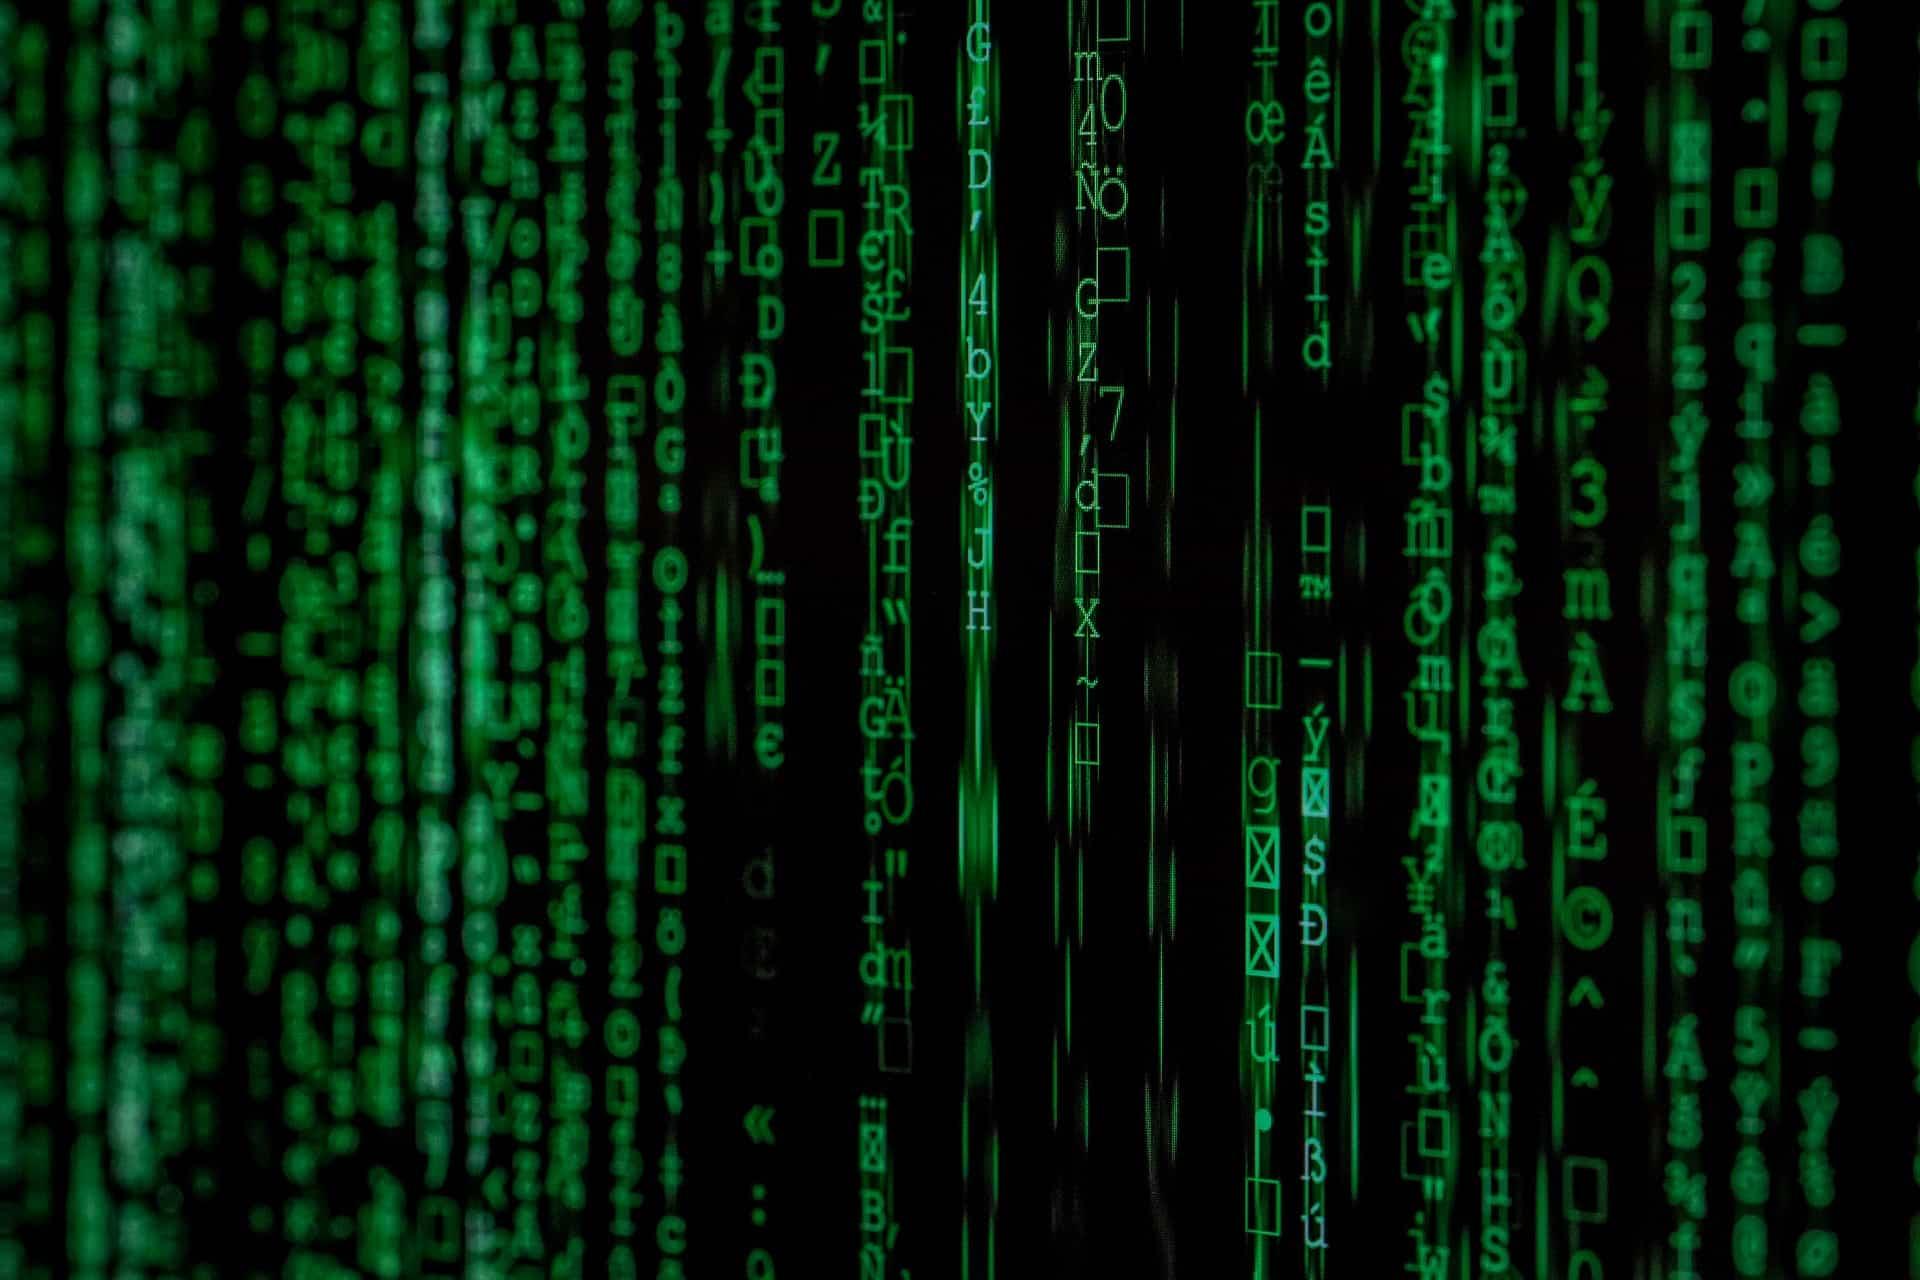 The Increase of Cyberattacks on Telehealth